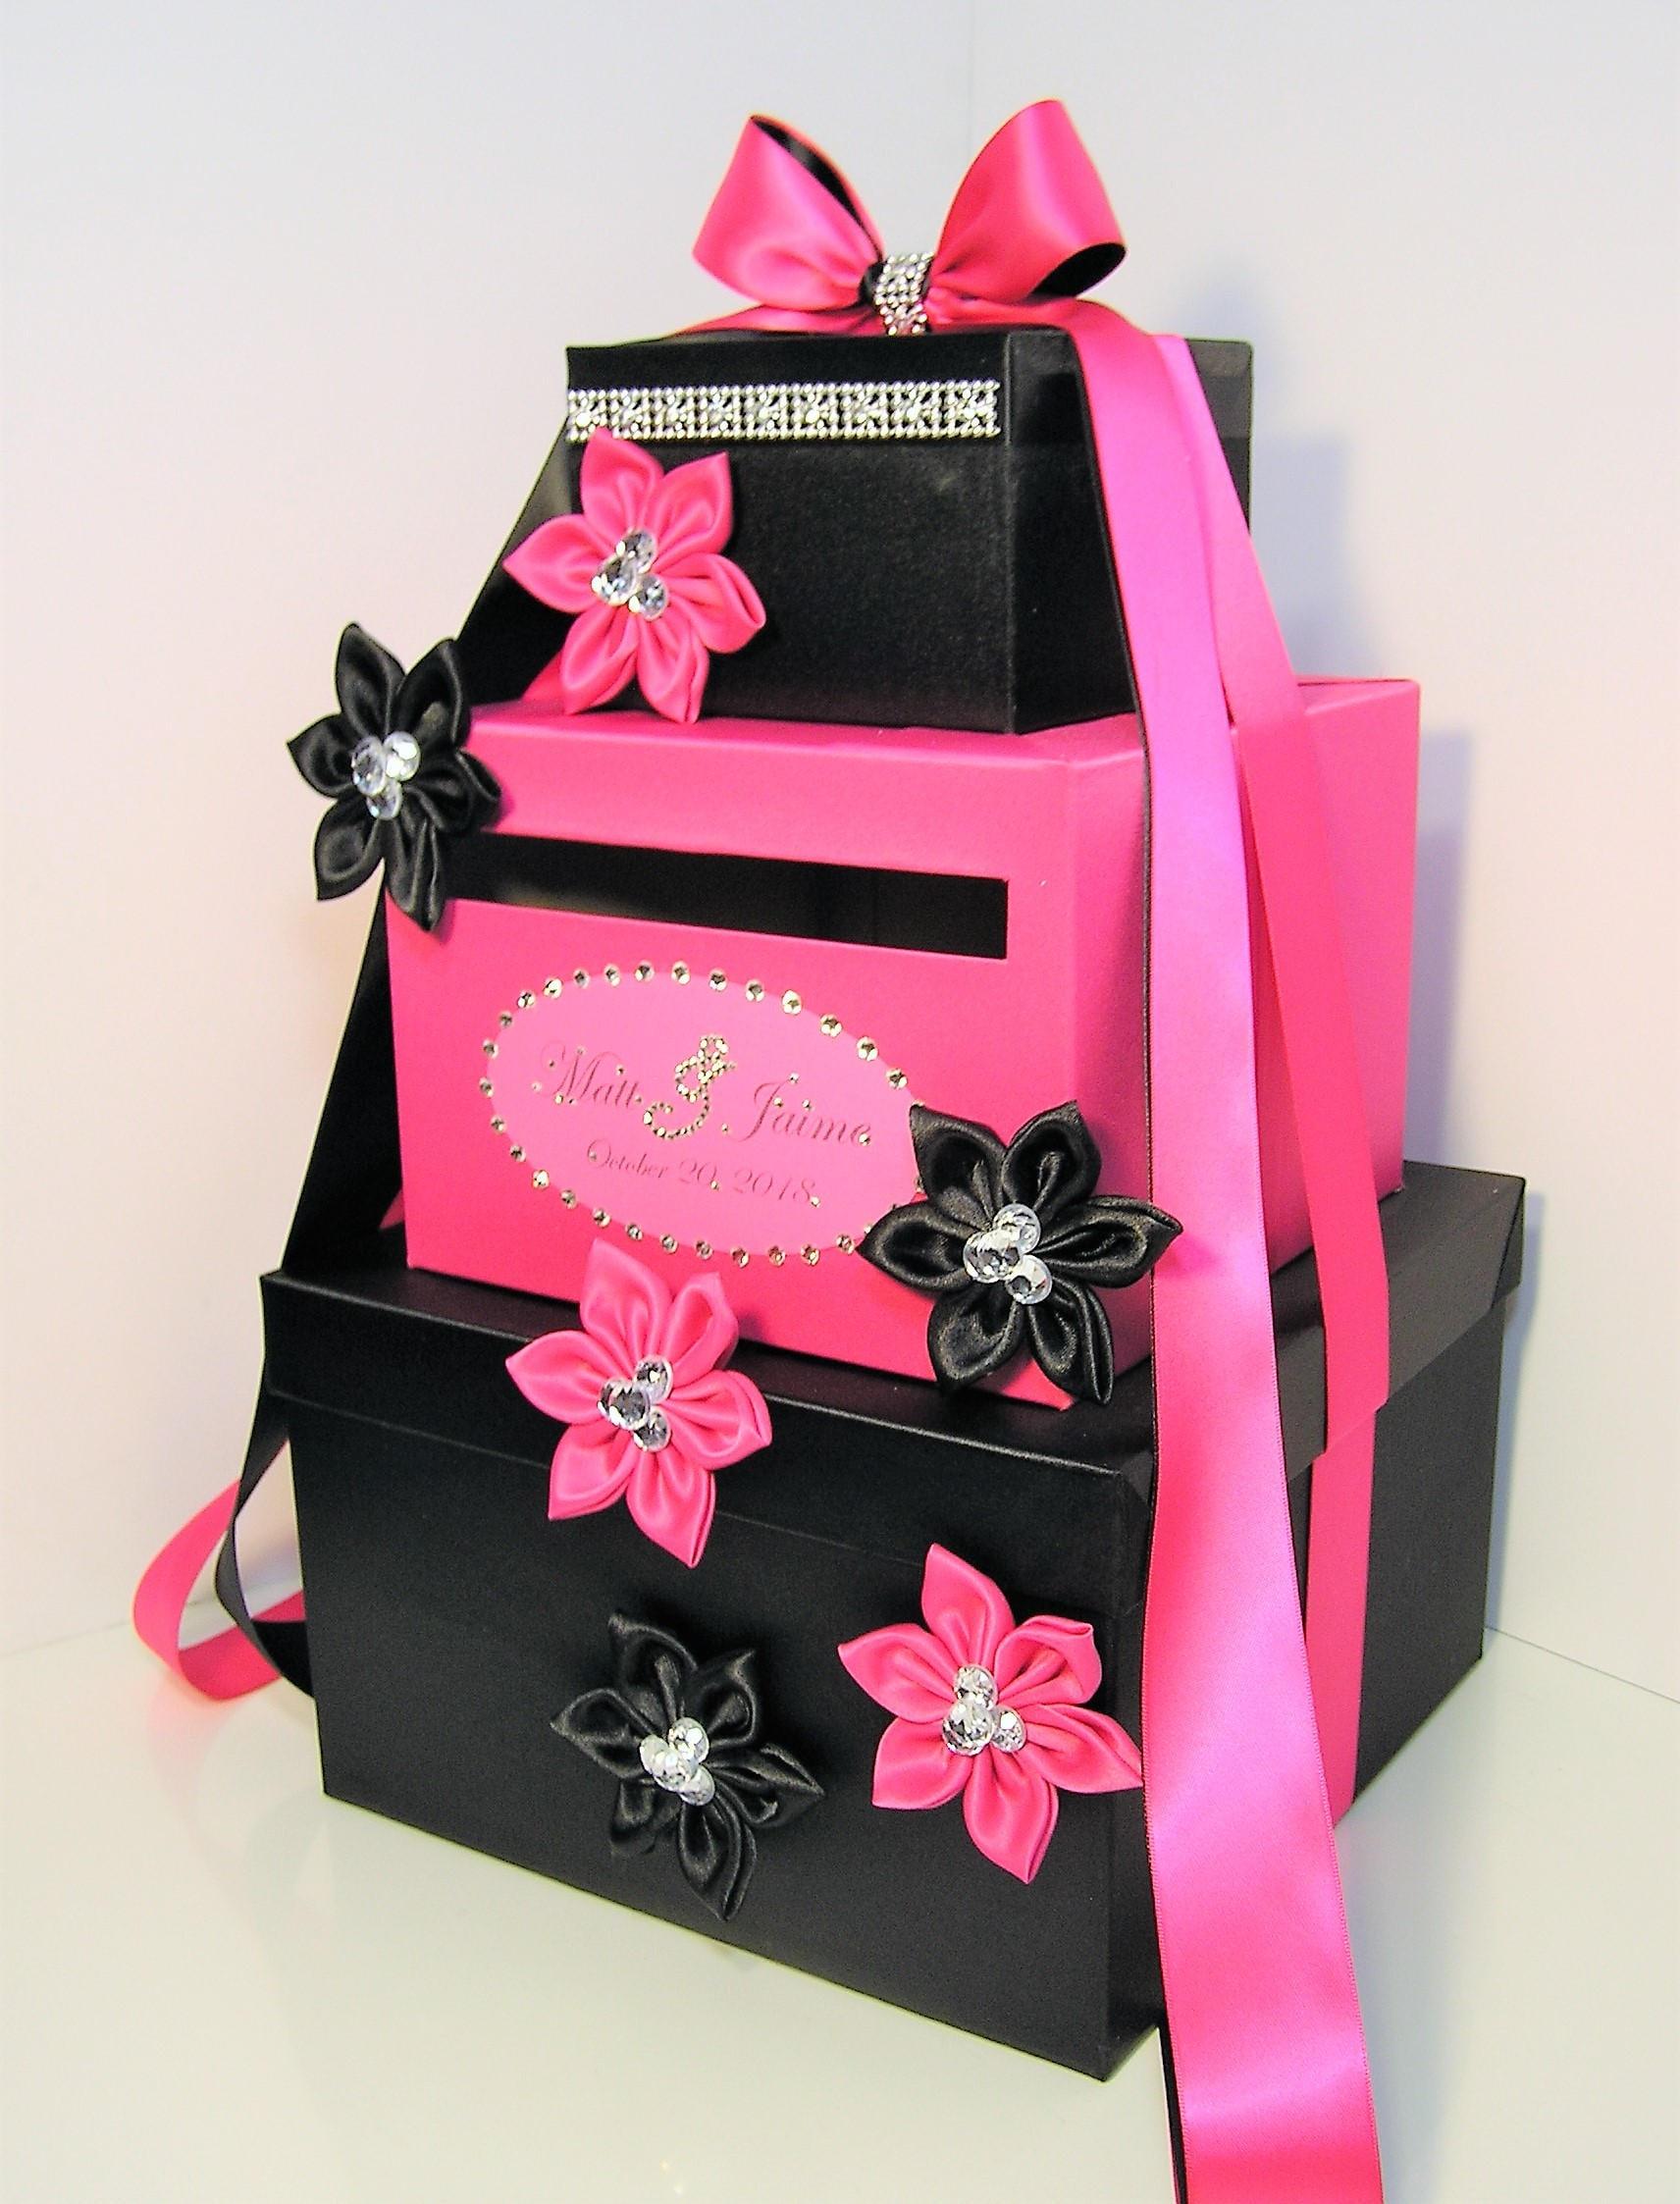 Wedding Card Box Black and Fuchsia/Shocking Pink Gift Card Box